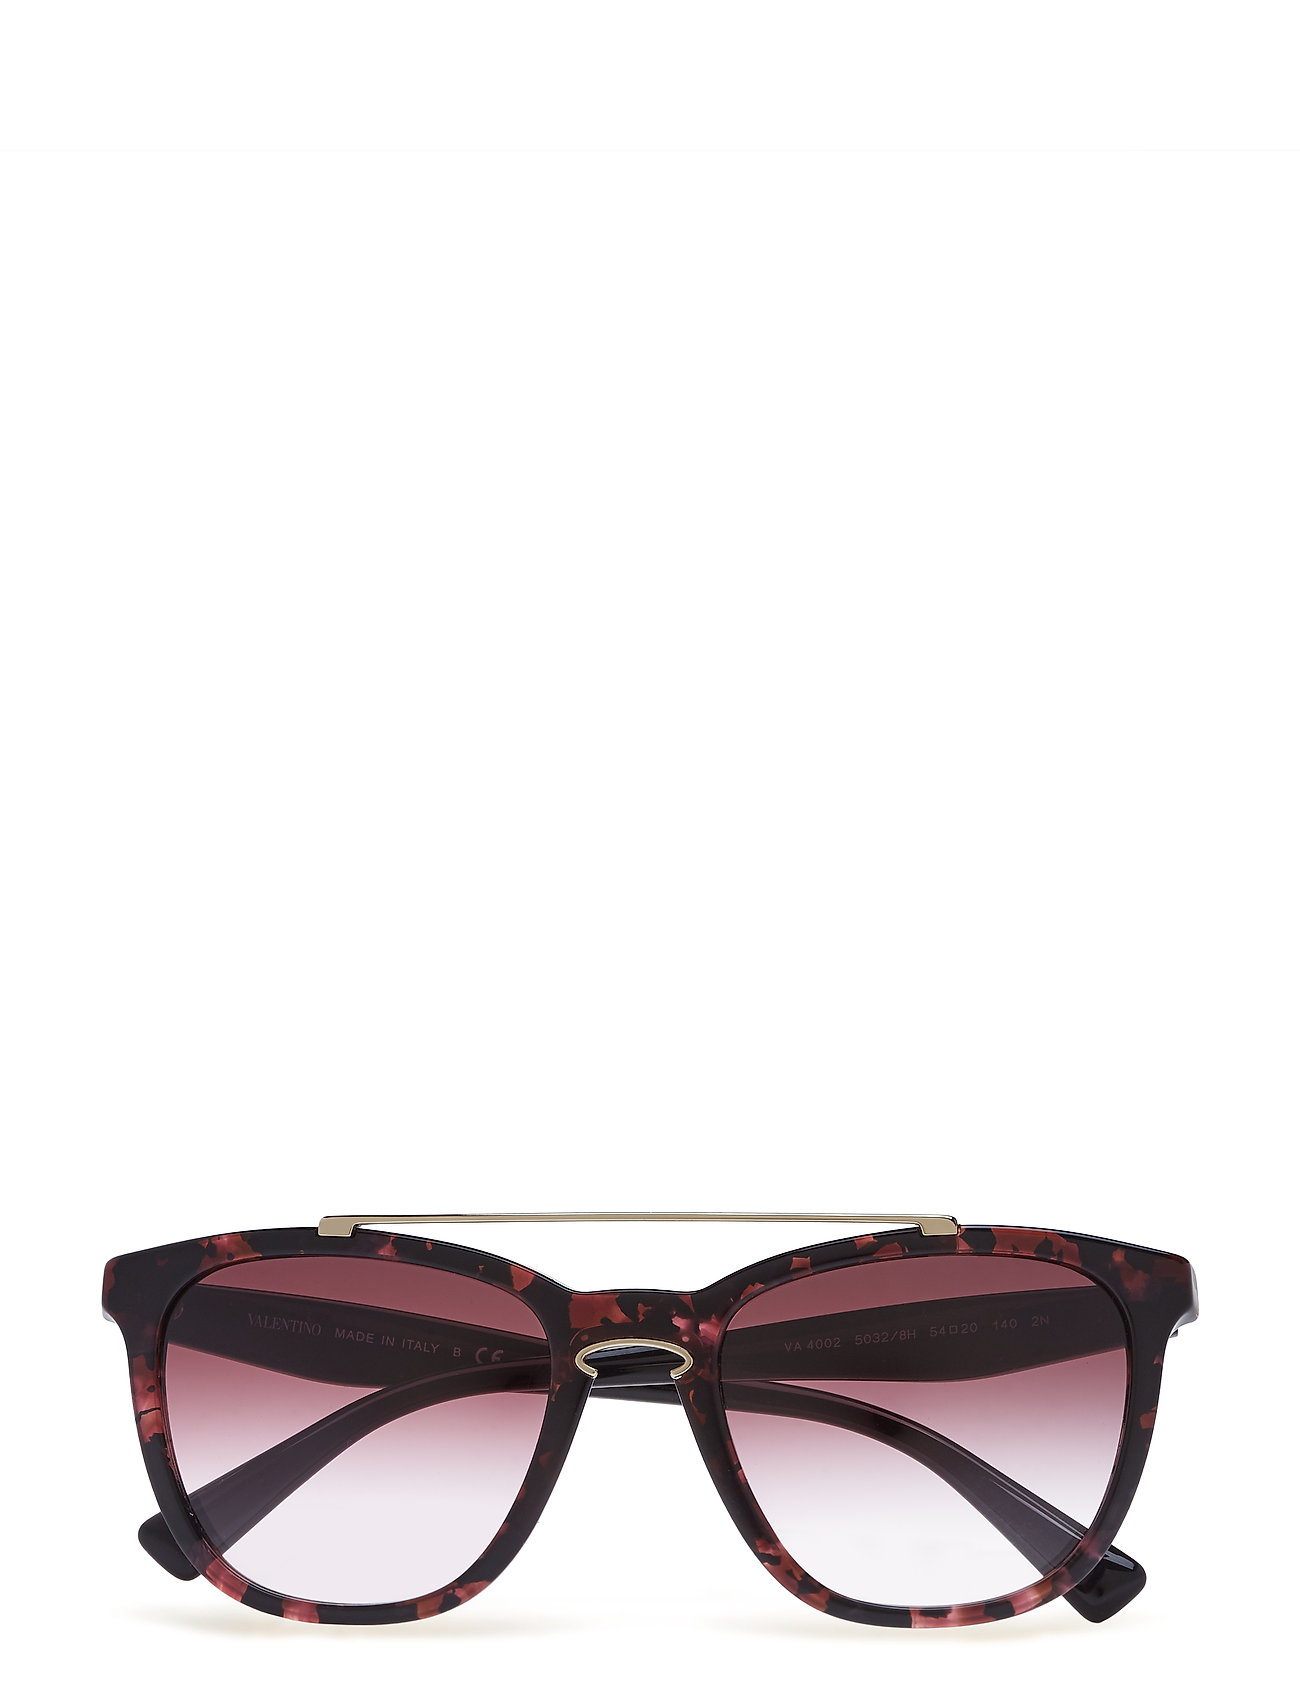 Rock Loop - Valentino Sunglasses